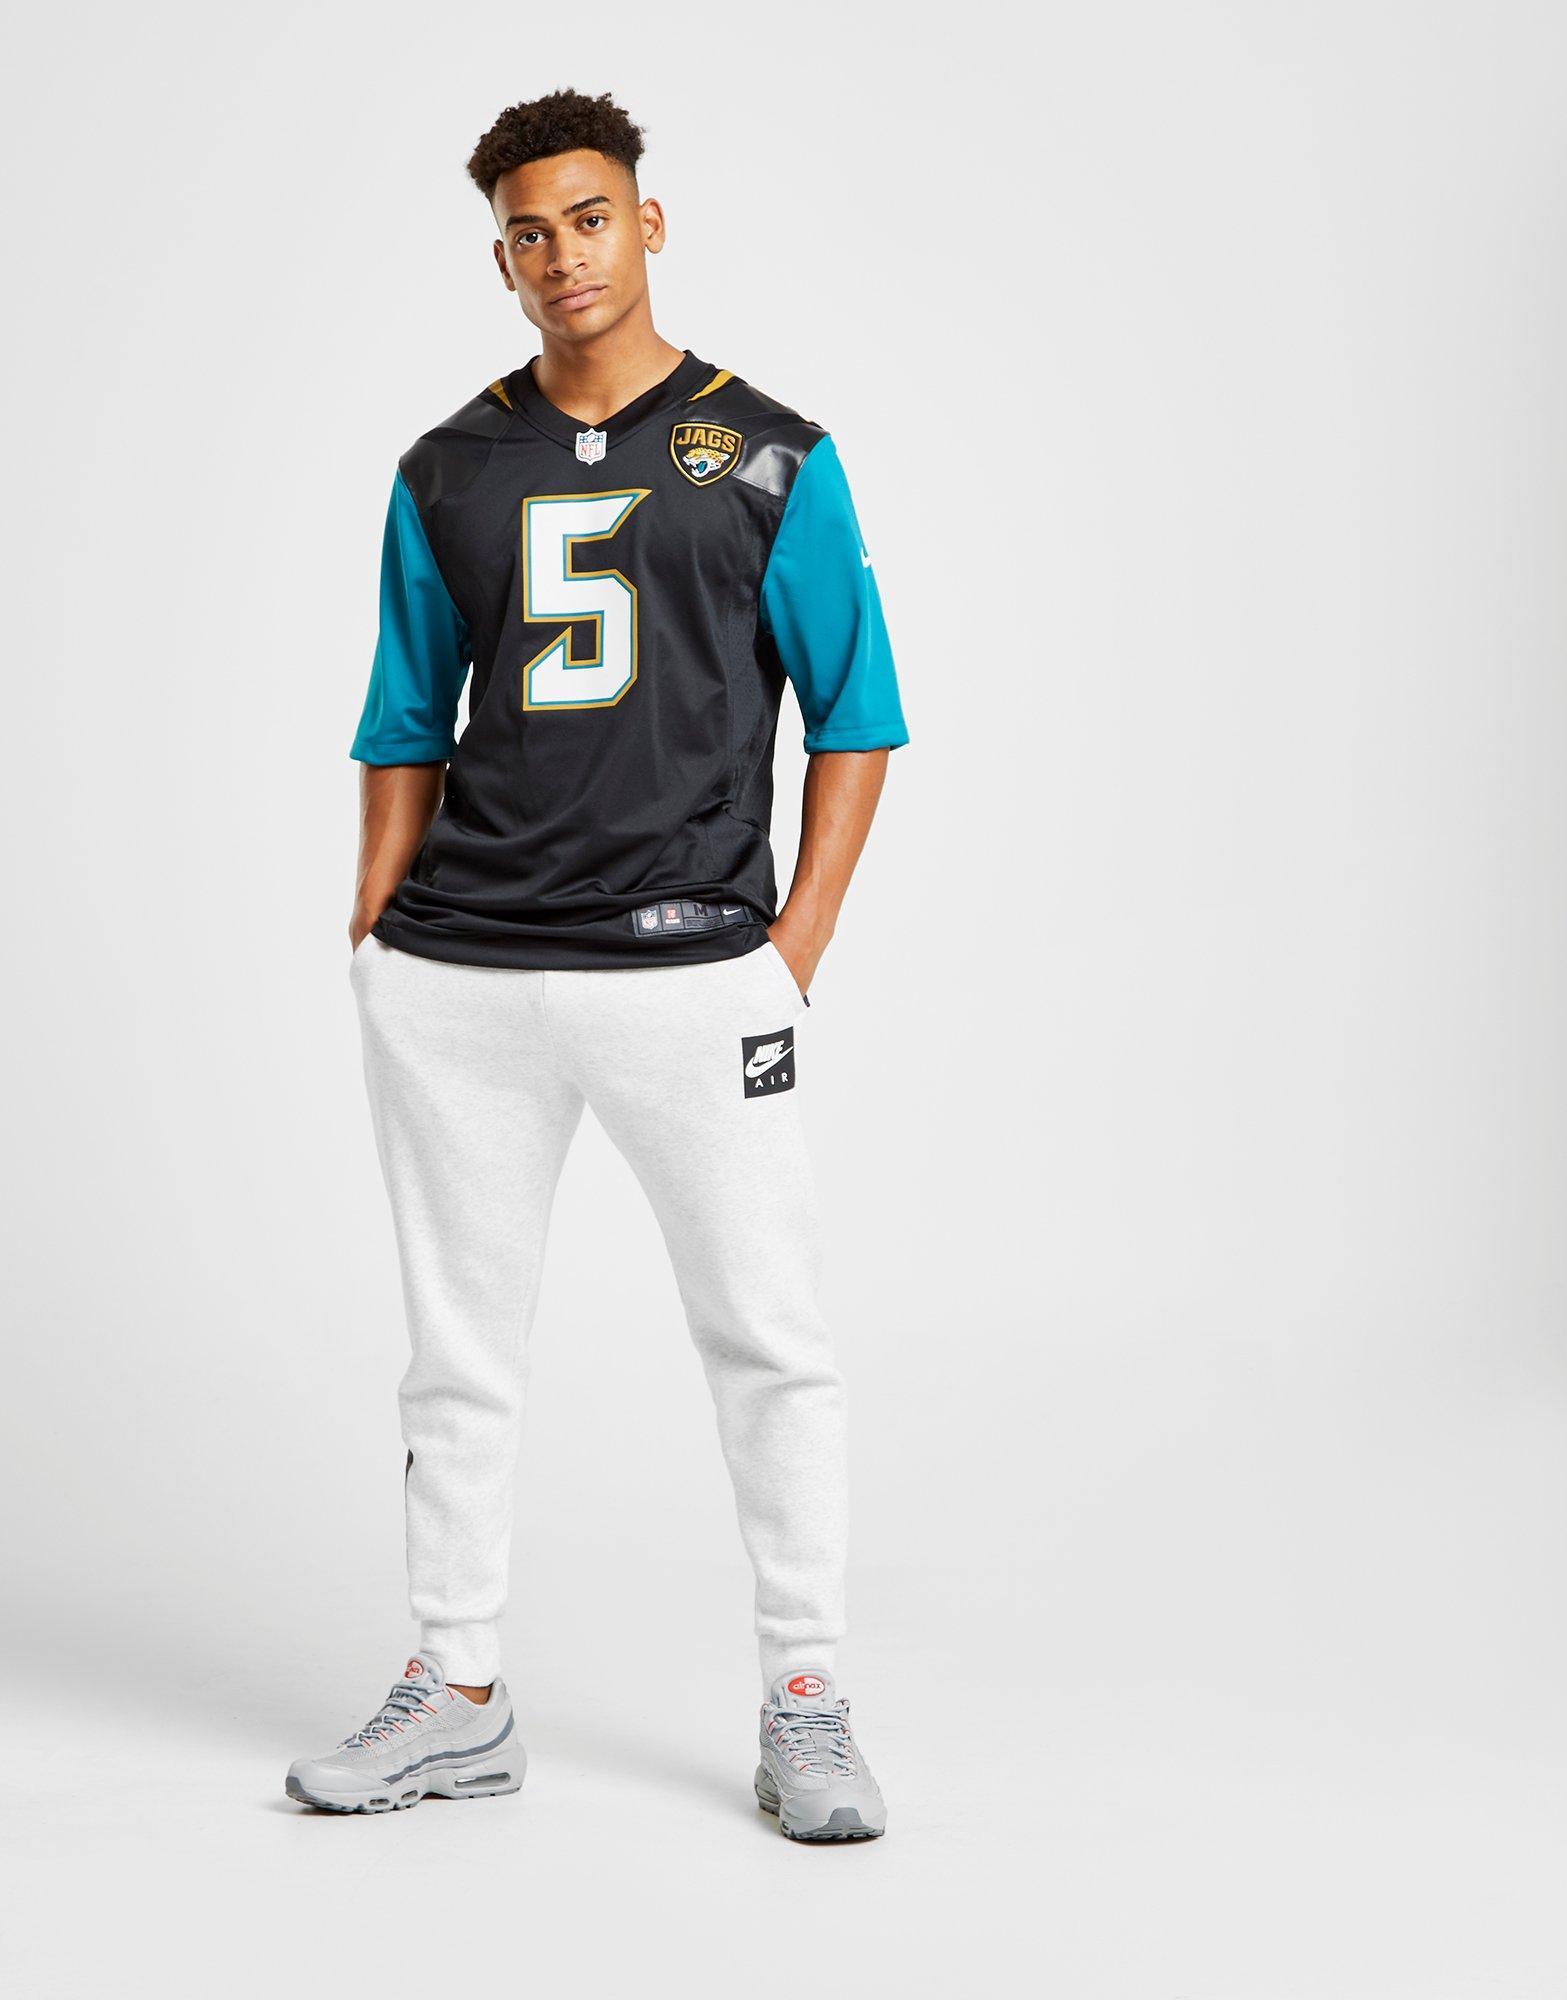 Nike Jacksonville Jaguars Jersey